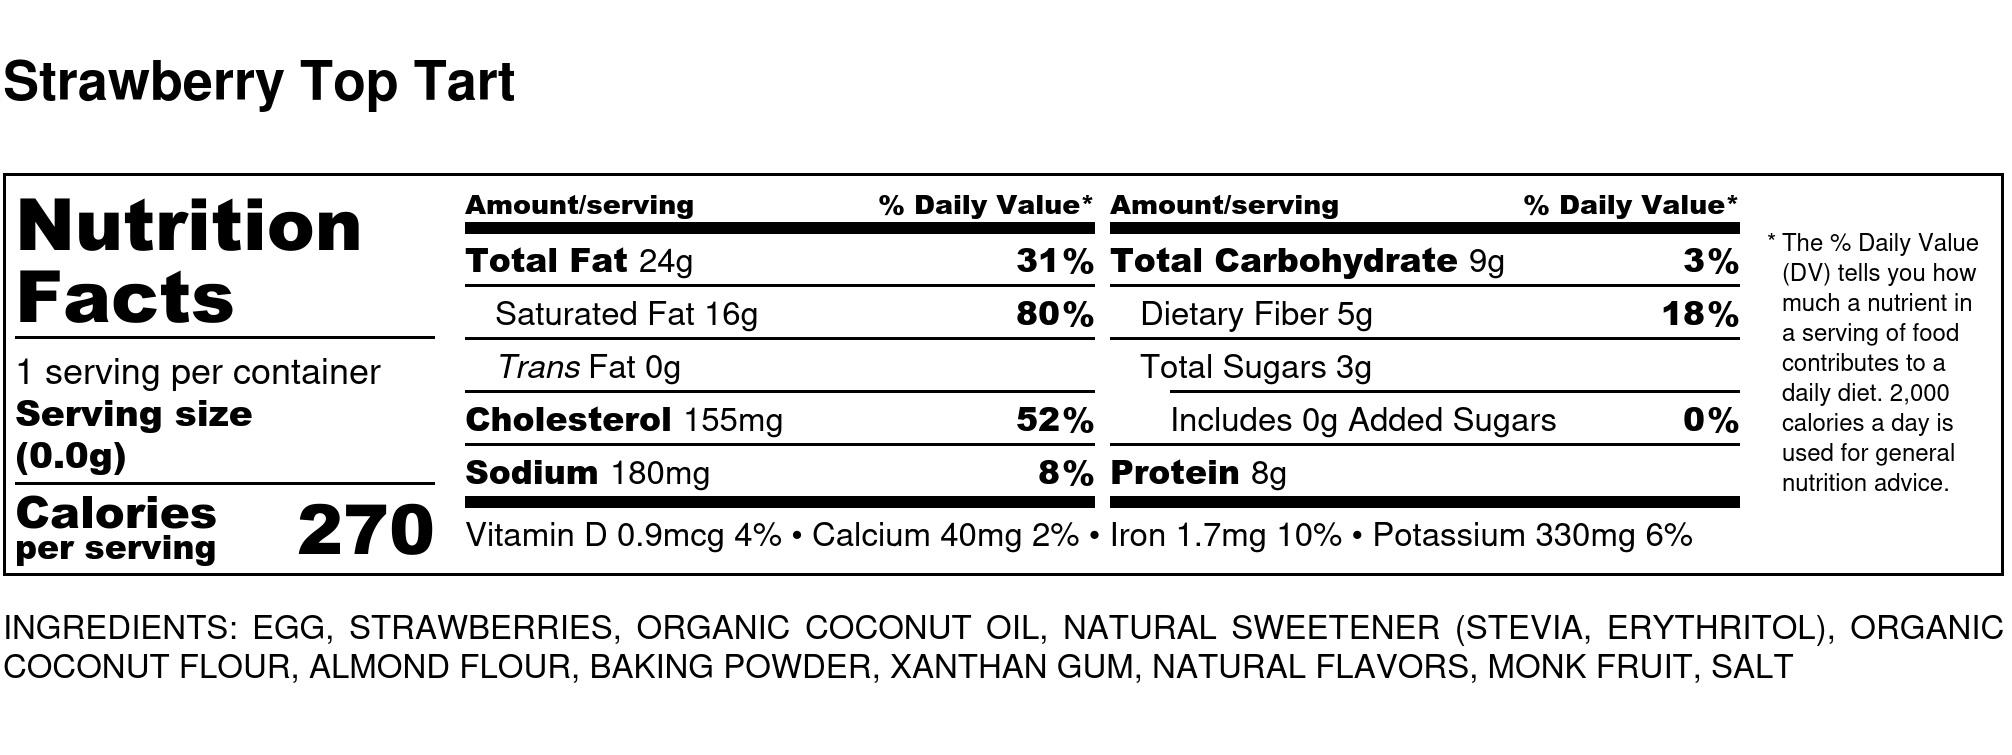 strawberry-top-tart-nutrition-label.jpg